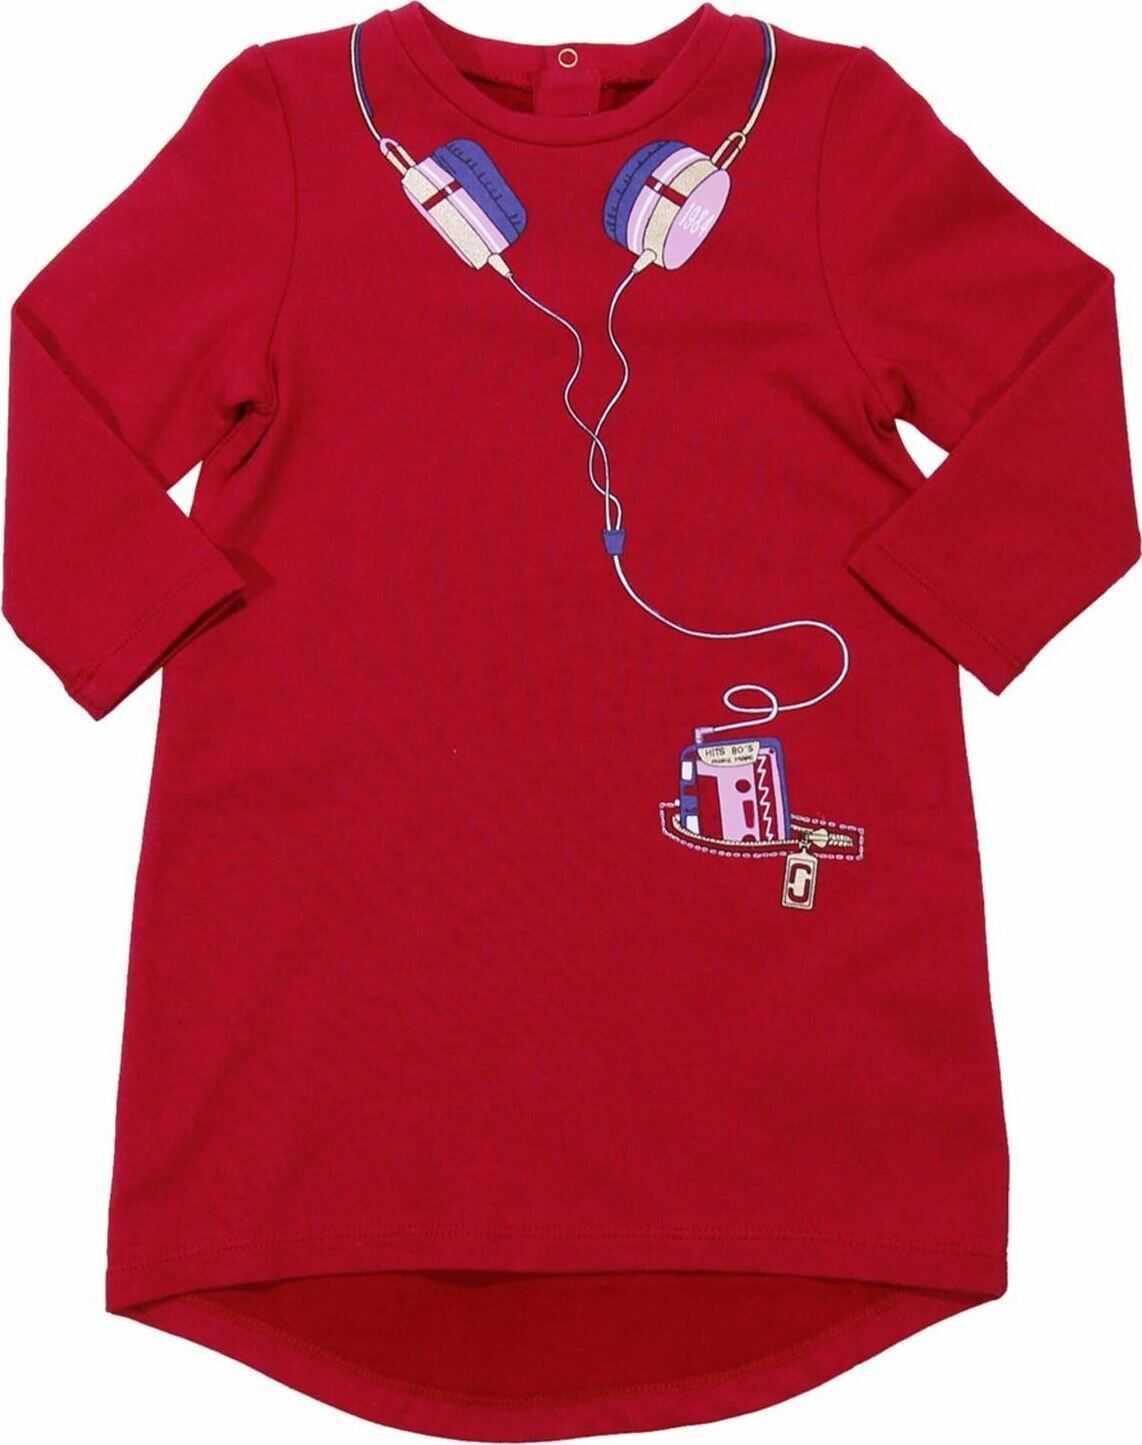 Little Marc Jacobs Red Trompe-L'oeil Dress* Red